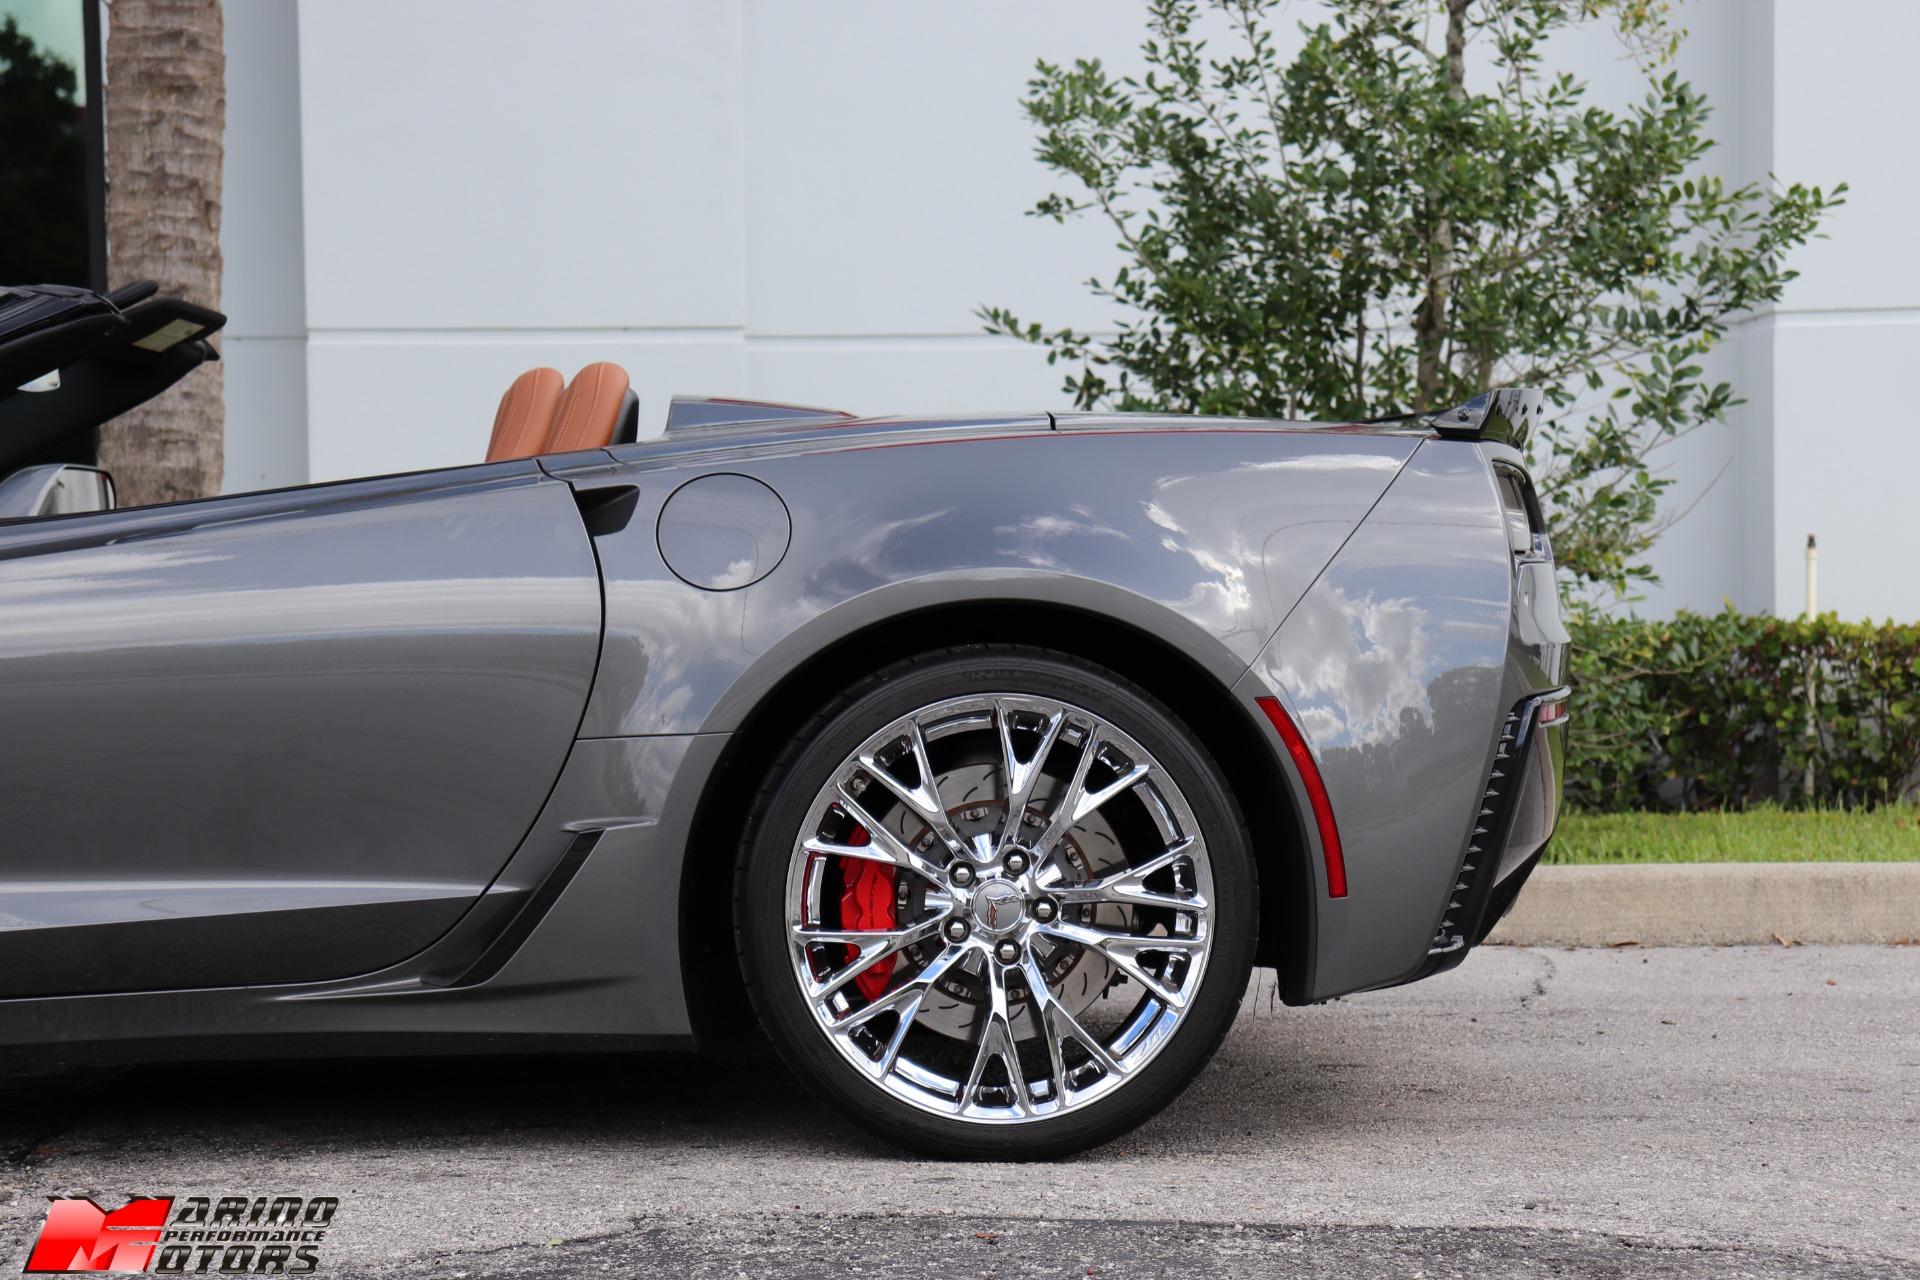 Used-2016-Chevrolet-Corvette-Z06-2LZ-Convertible